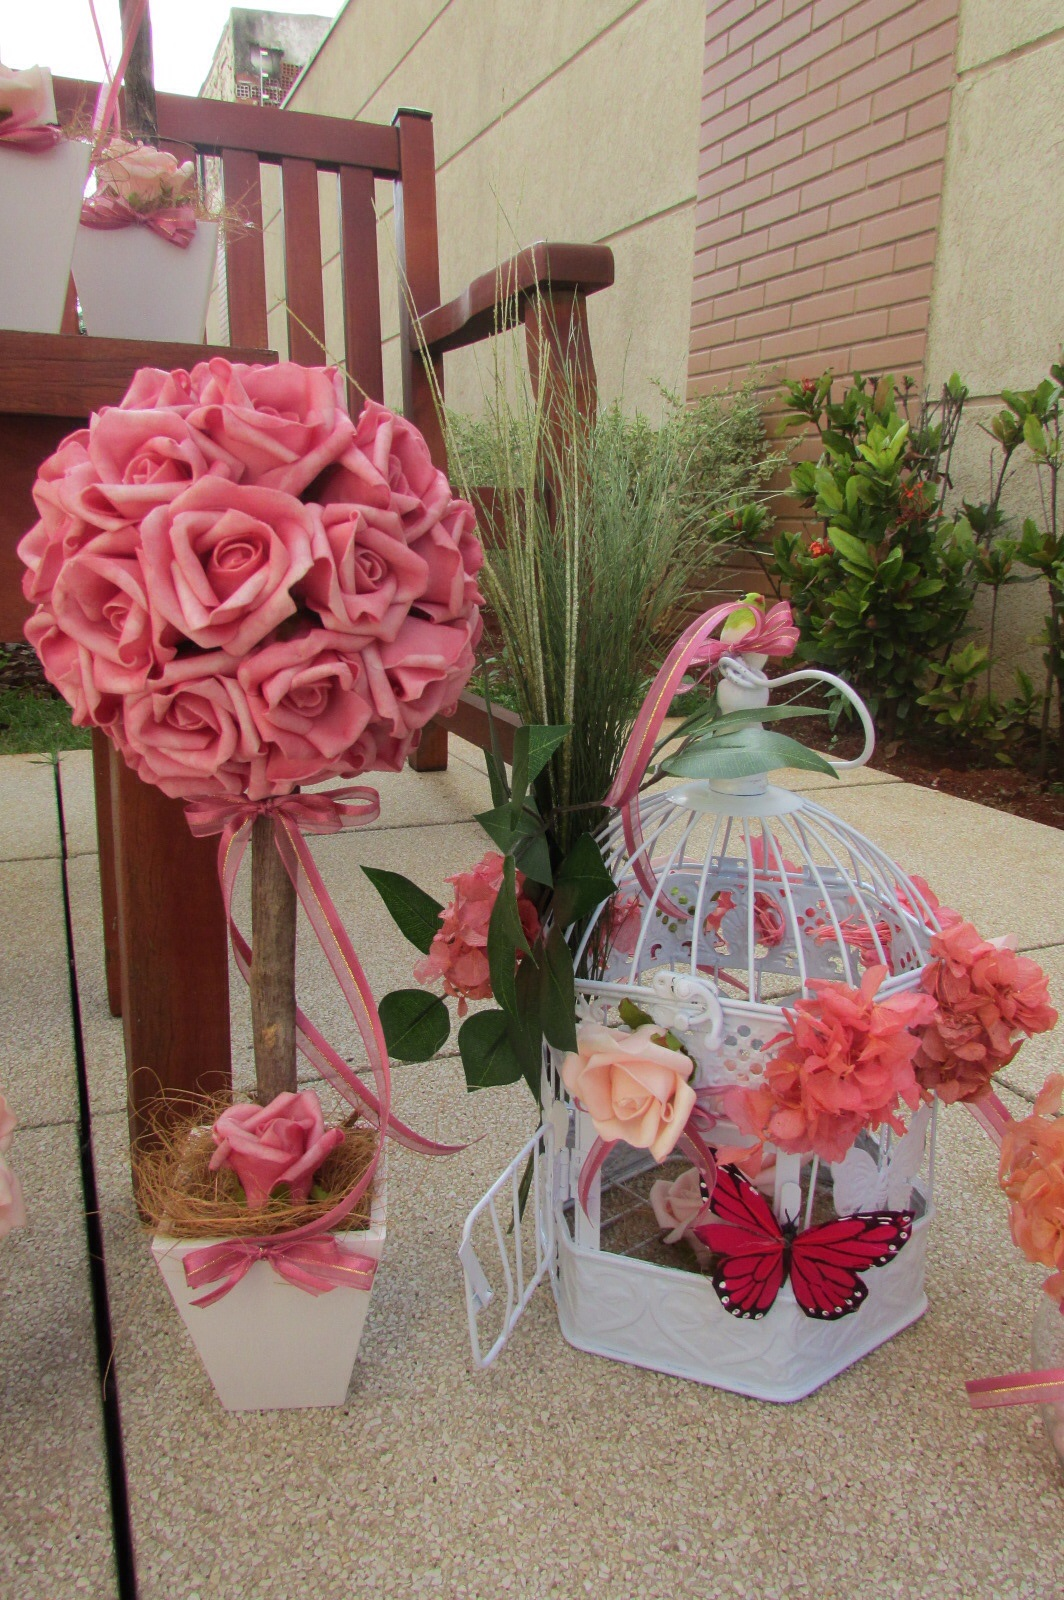 decoracao festa jardim encantado provencal:festa jardim encantado rosa e pink i mini casamento kit festa jardim